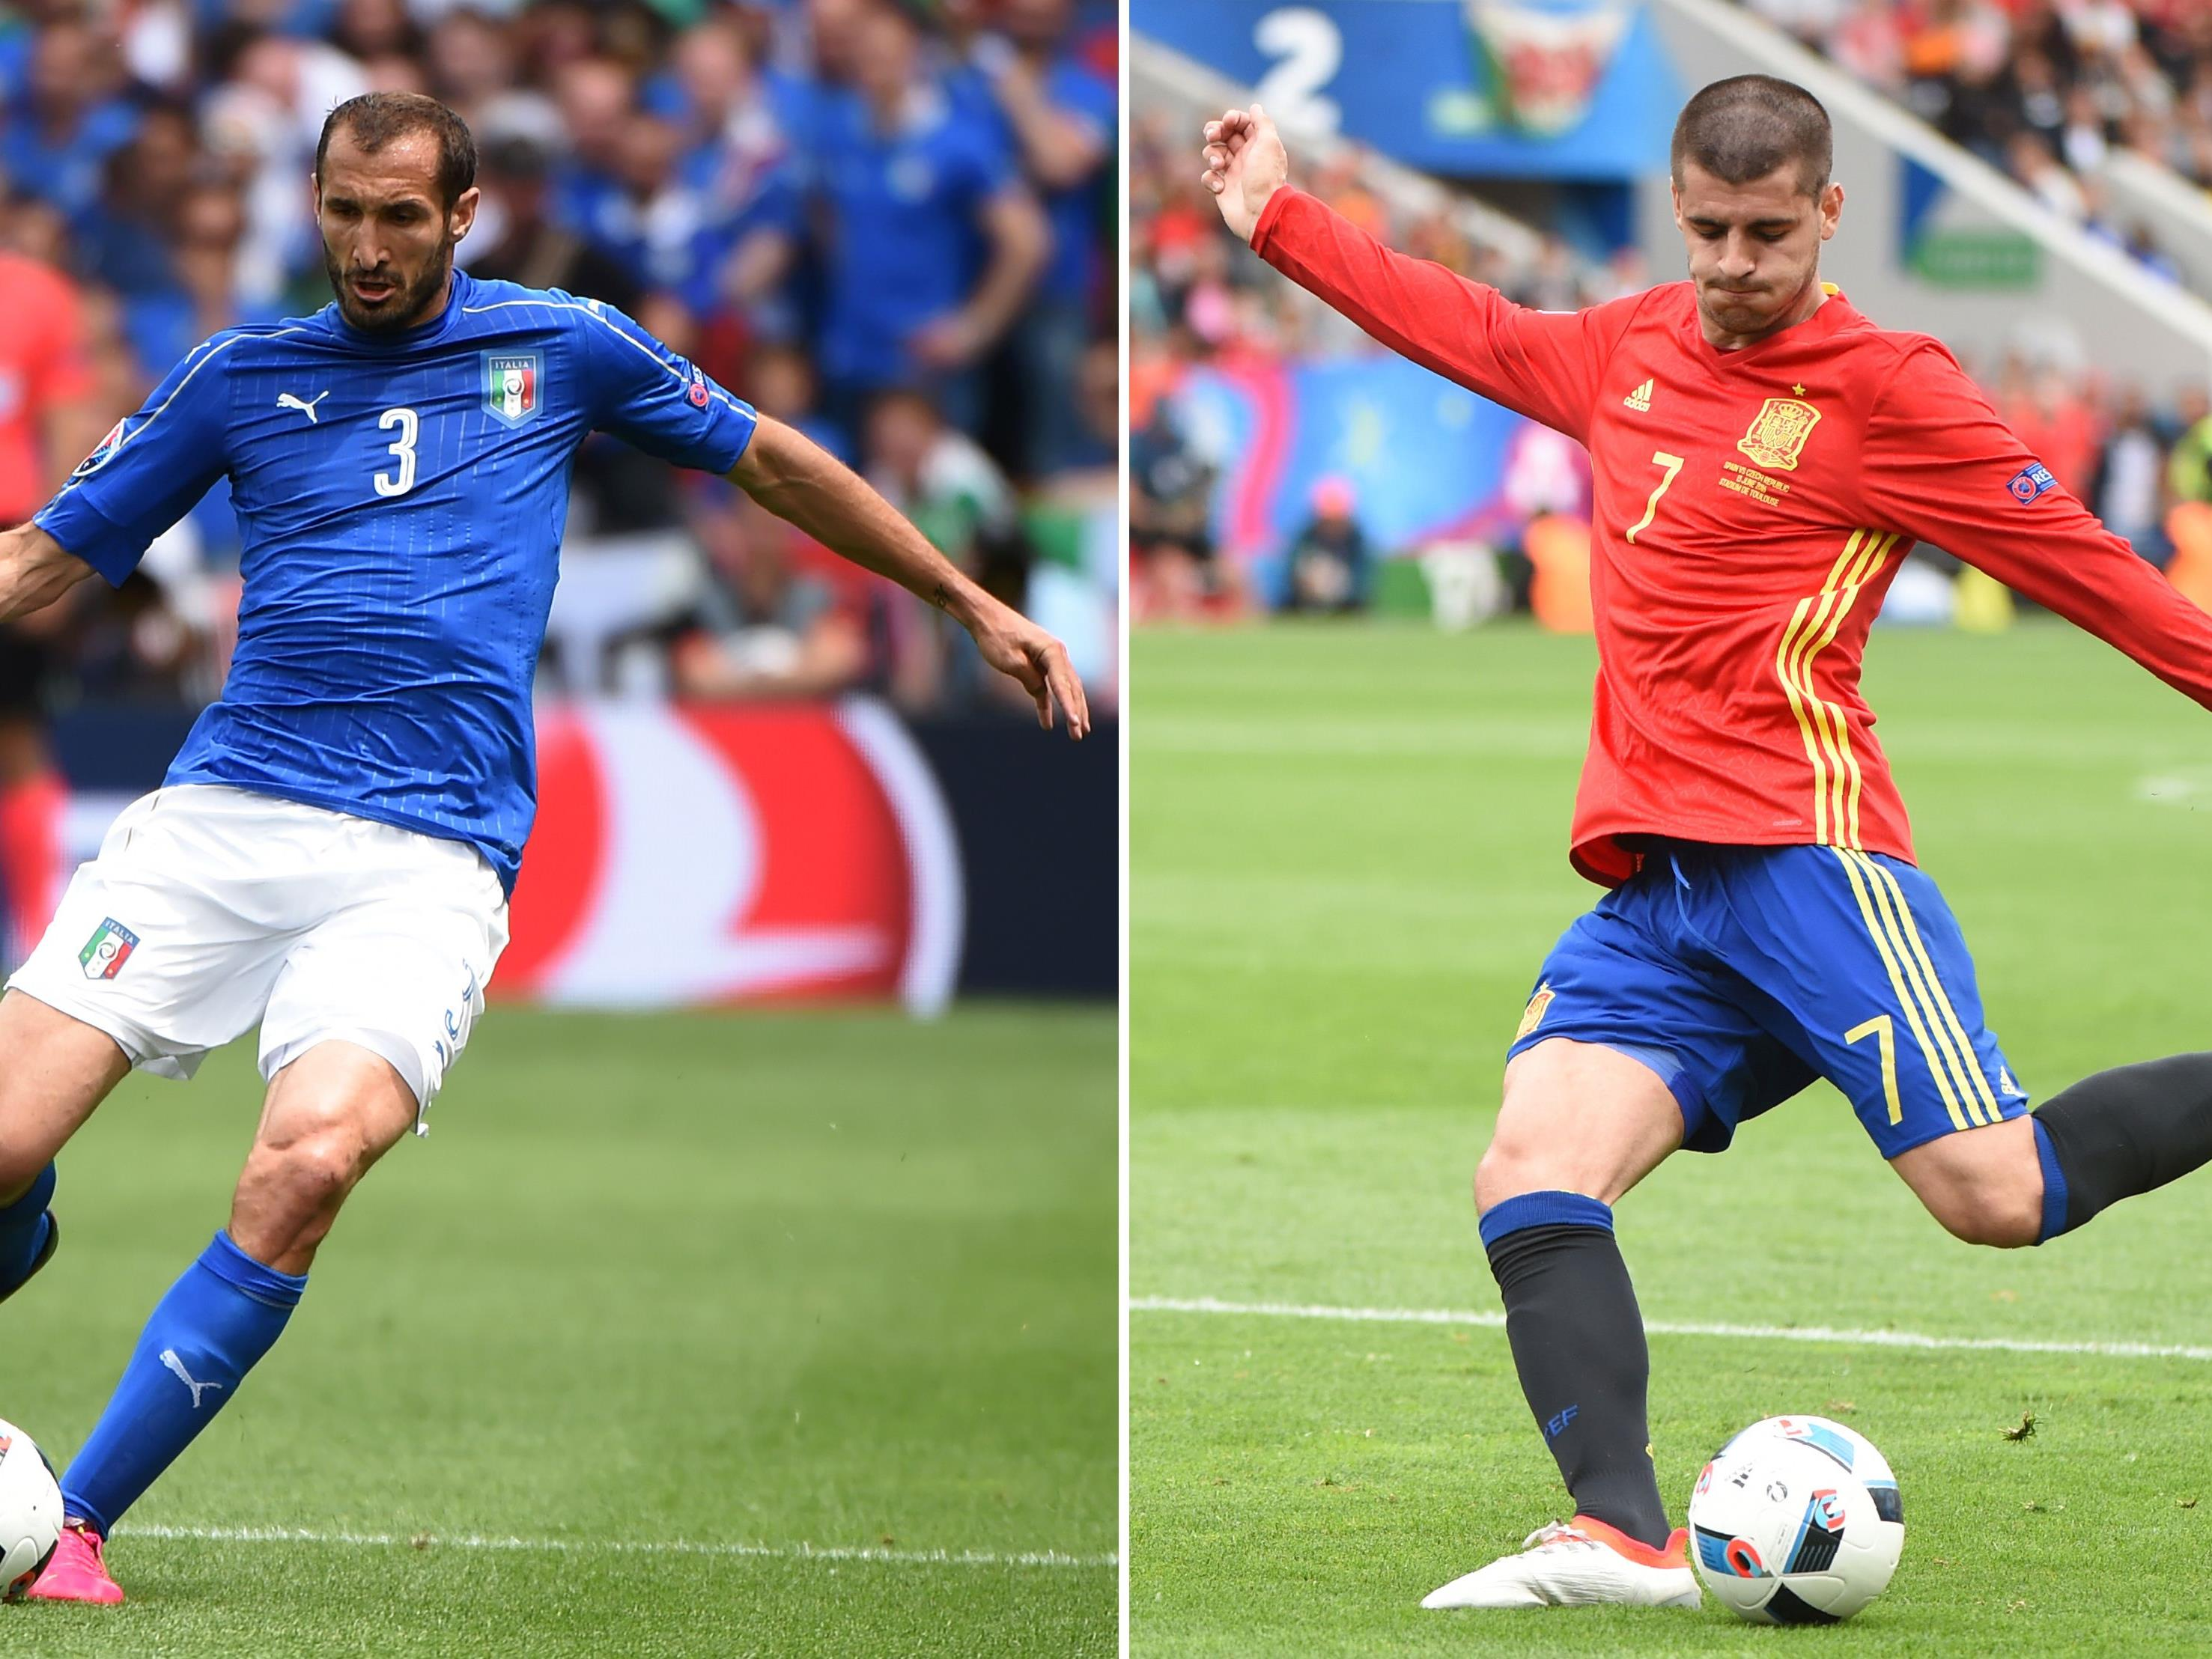 Italien Spanien Live